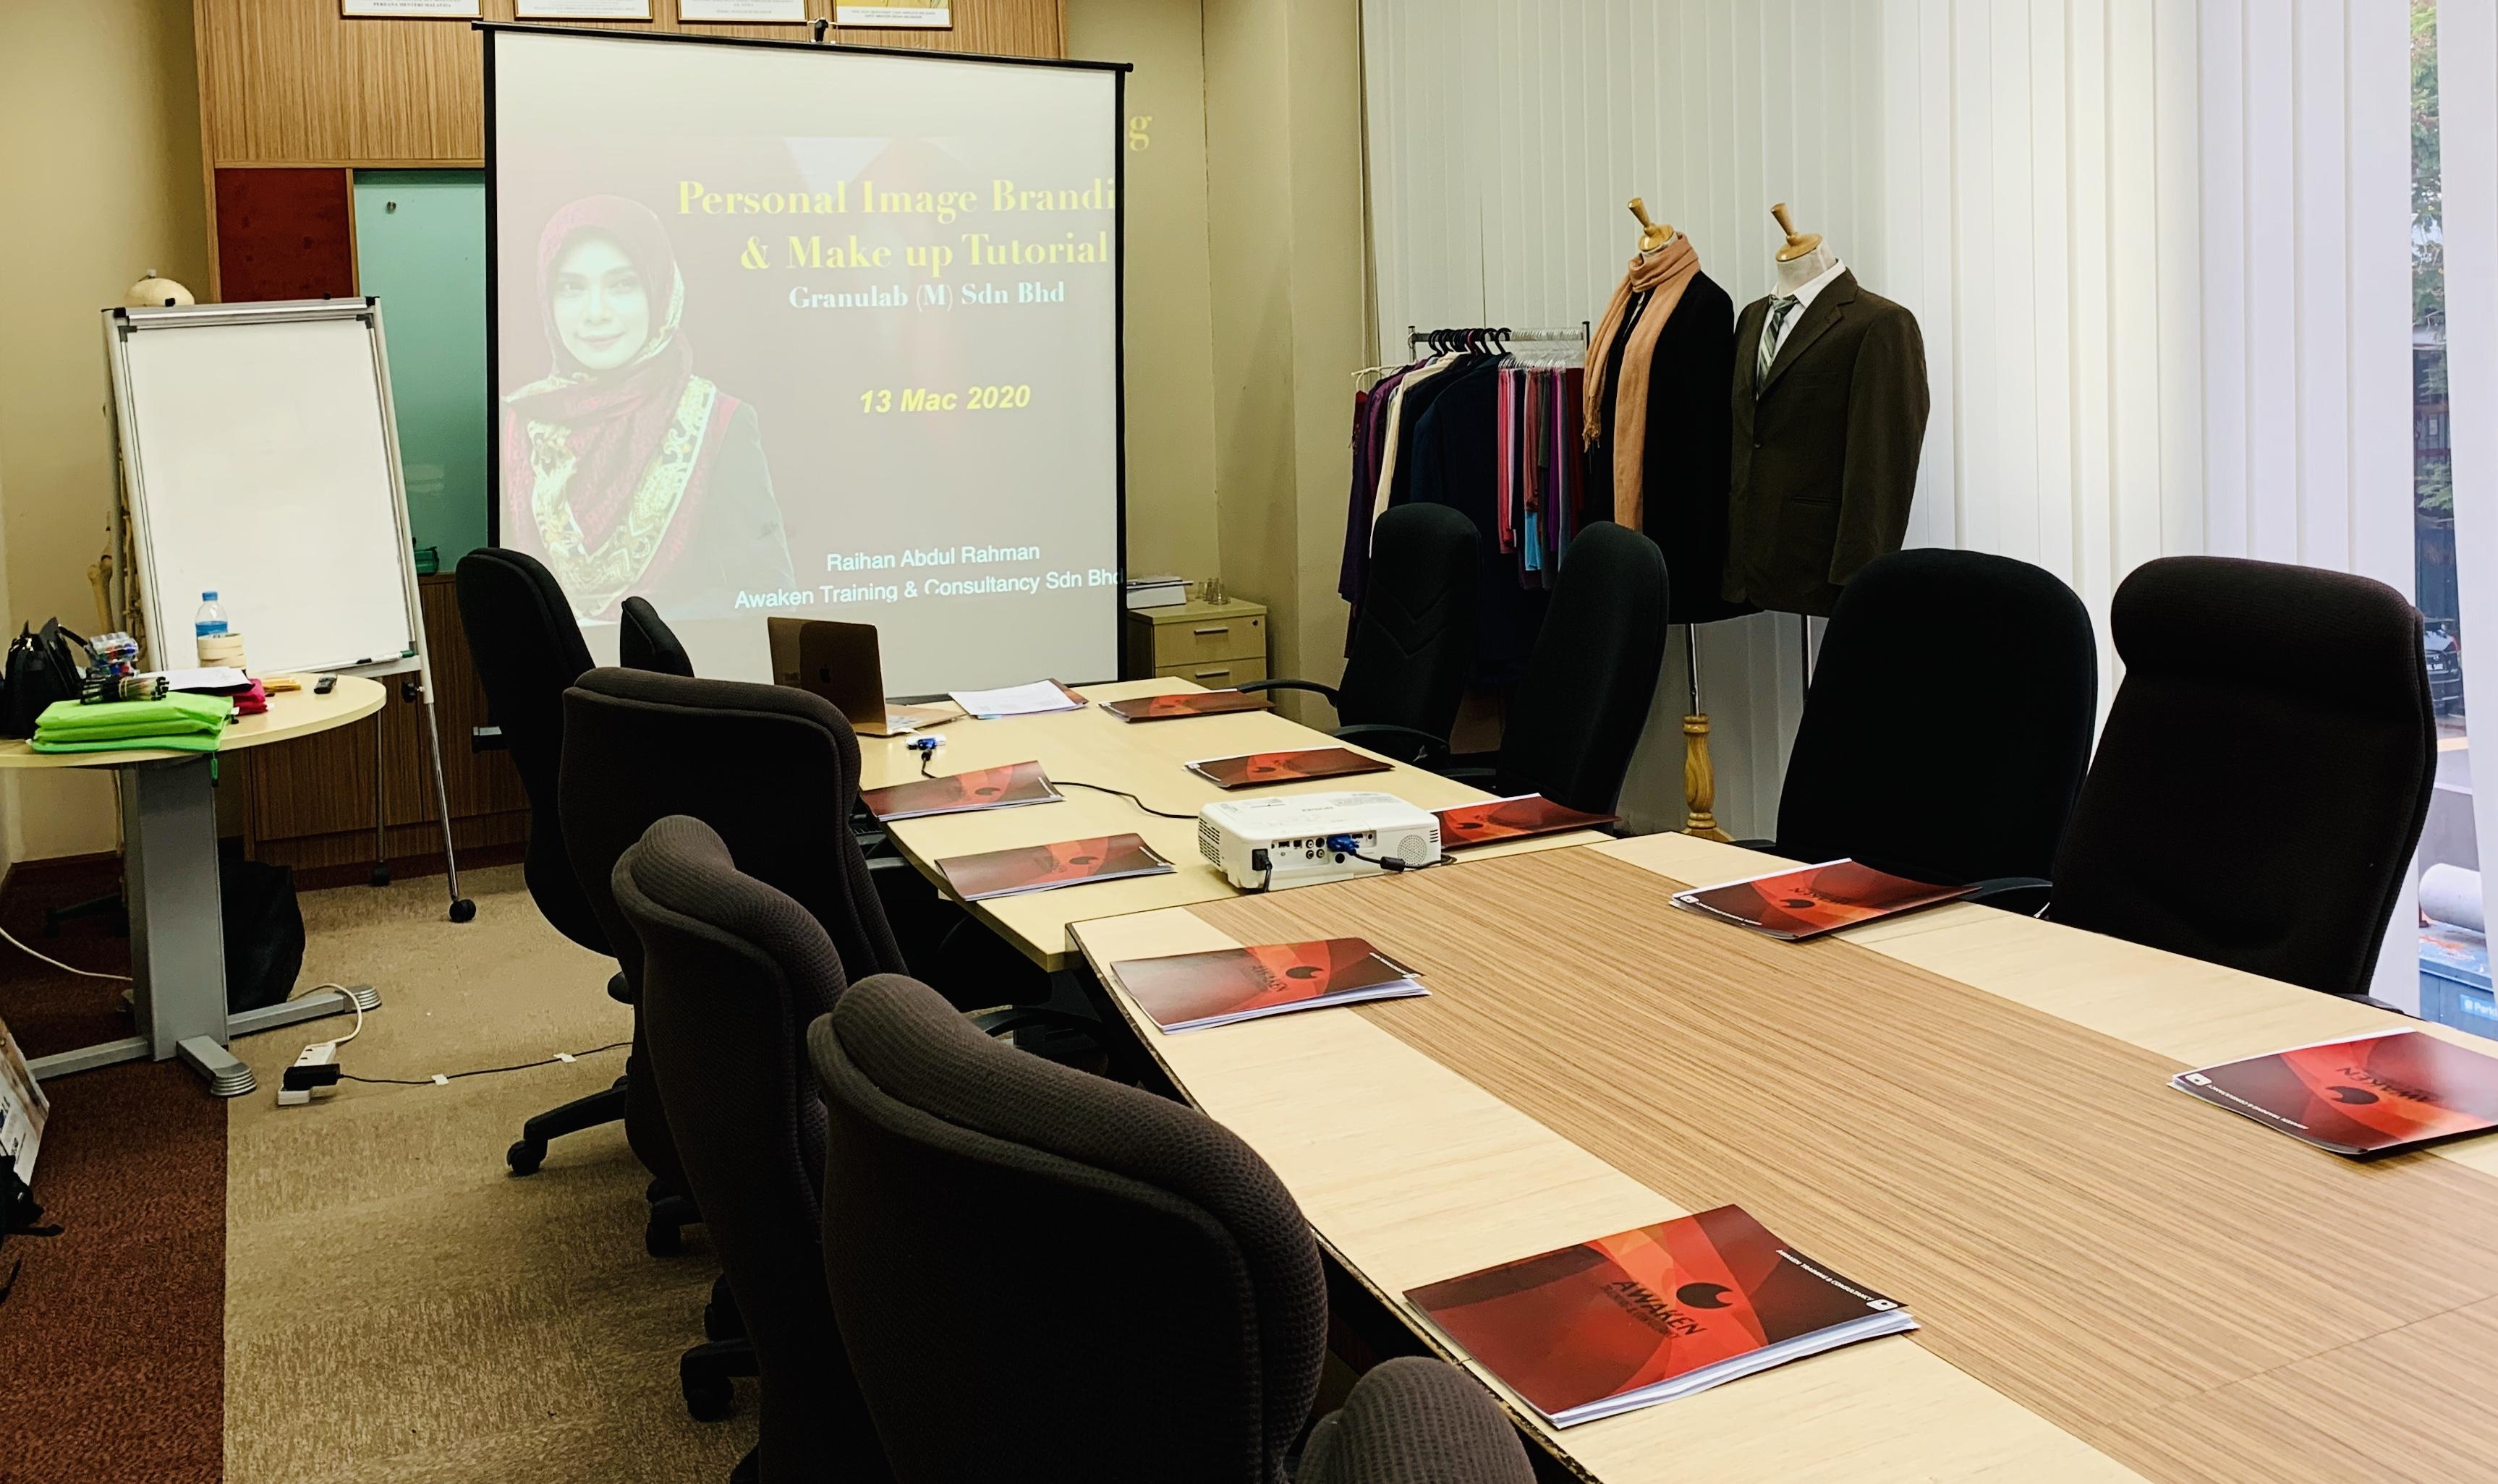 Kursus Personal Image Branding & Make Up Tutorial | Granulab (M) Sdn Bhd | 13 Mac 2020